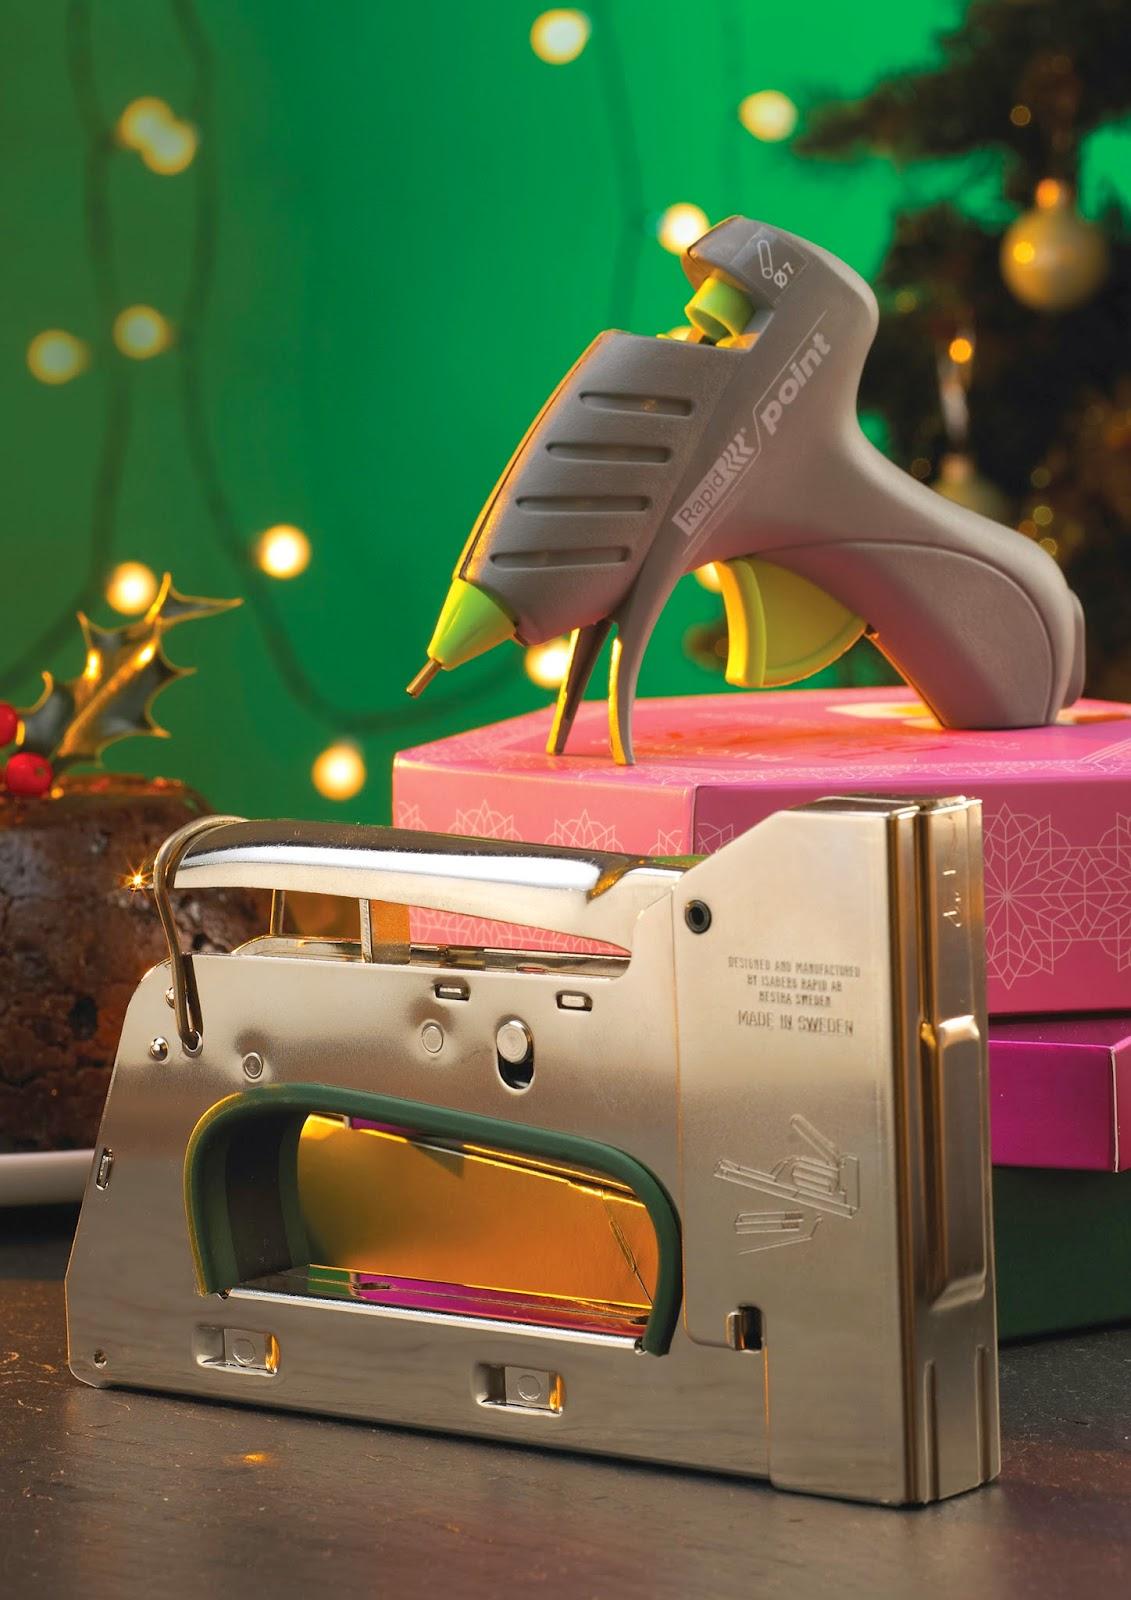 http://www.beesleyandfildes.co.uk/rapid-heavy-duty-staple-gun-with-free-glue-gun-ref-xms14staple/